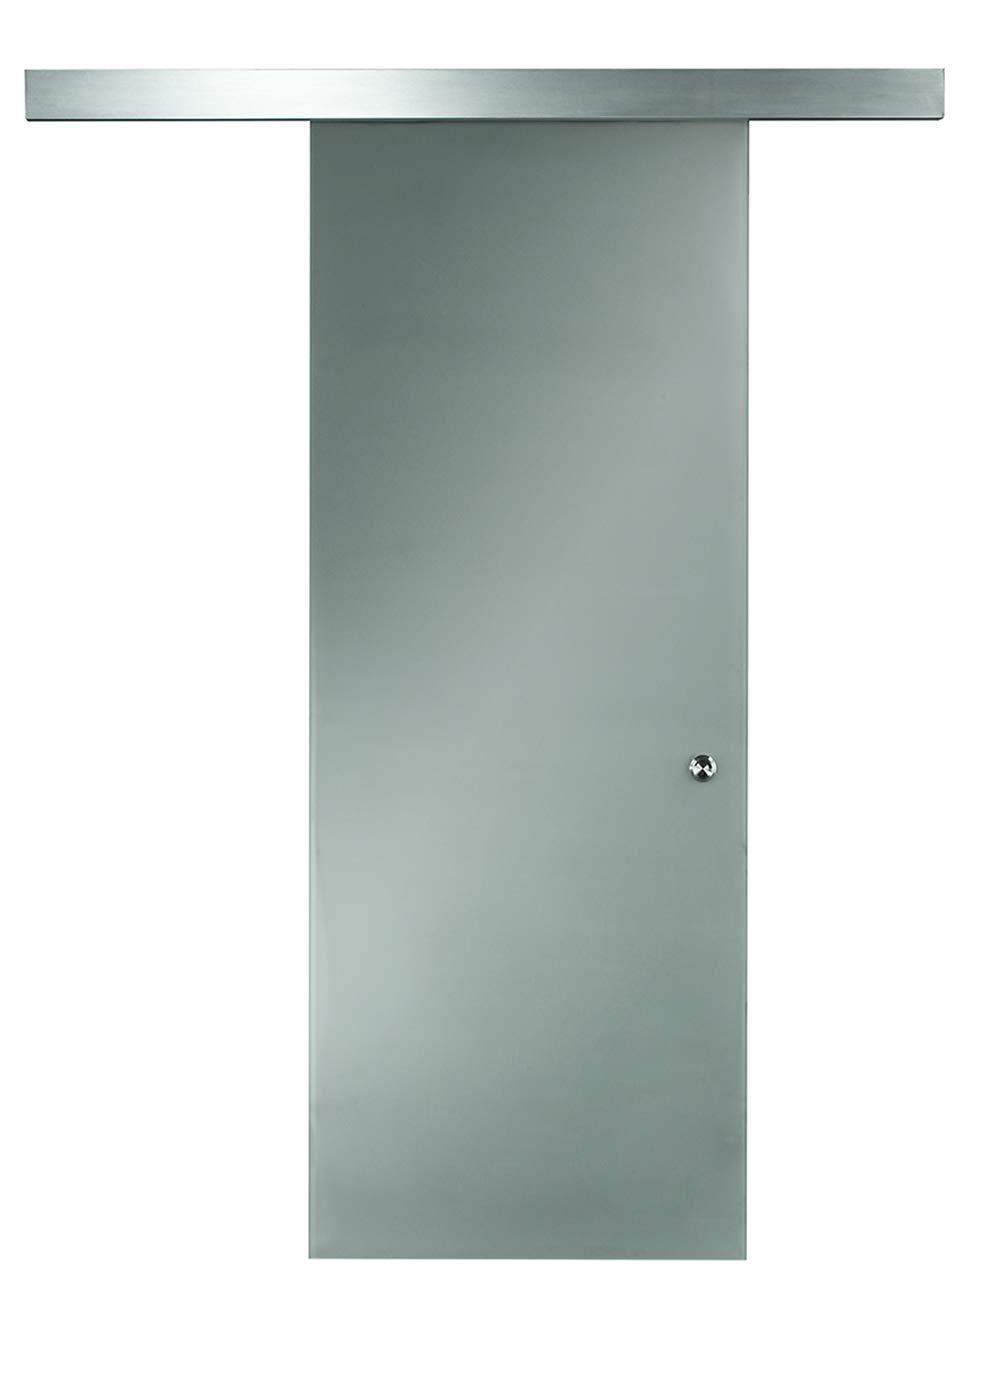 Pinecroft 8BDGL3696OP Opaque Interior Glass Barn Door, 36'' x 96'' by LTL Home Products